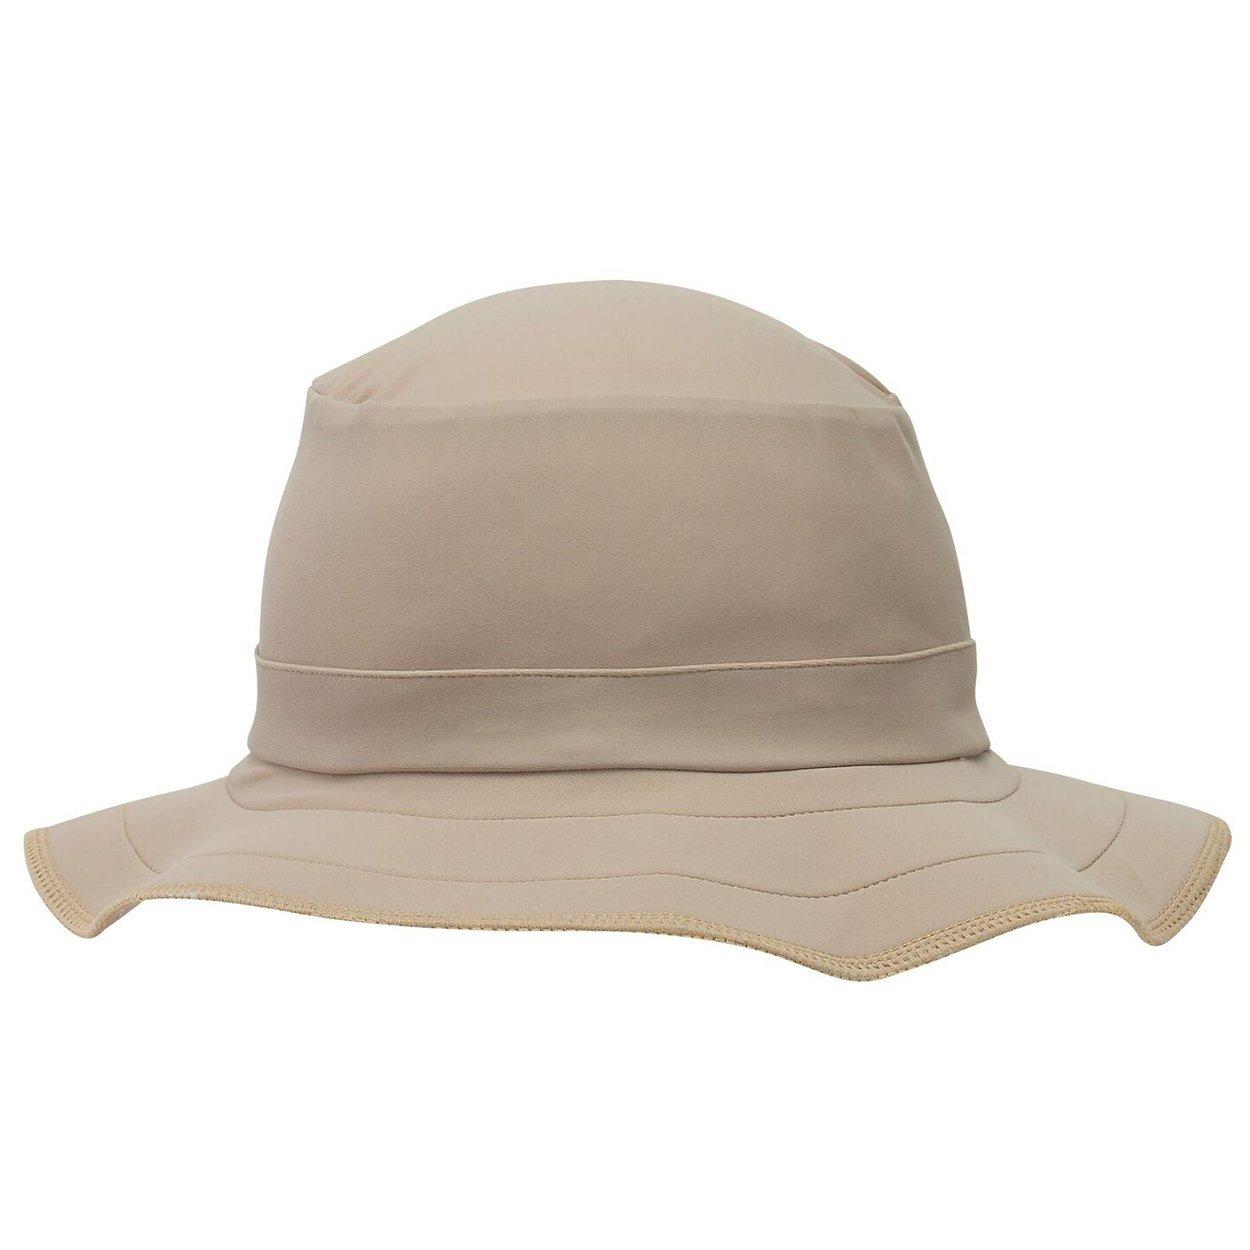 e14f83b7295a3 Kids Funky Bucket Hat Upf 50 By Swimlids Khaki Small 2 10 Unisex Sunpoplife